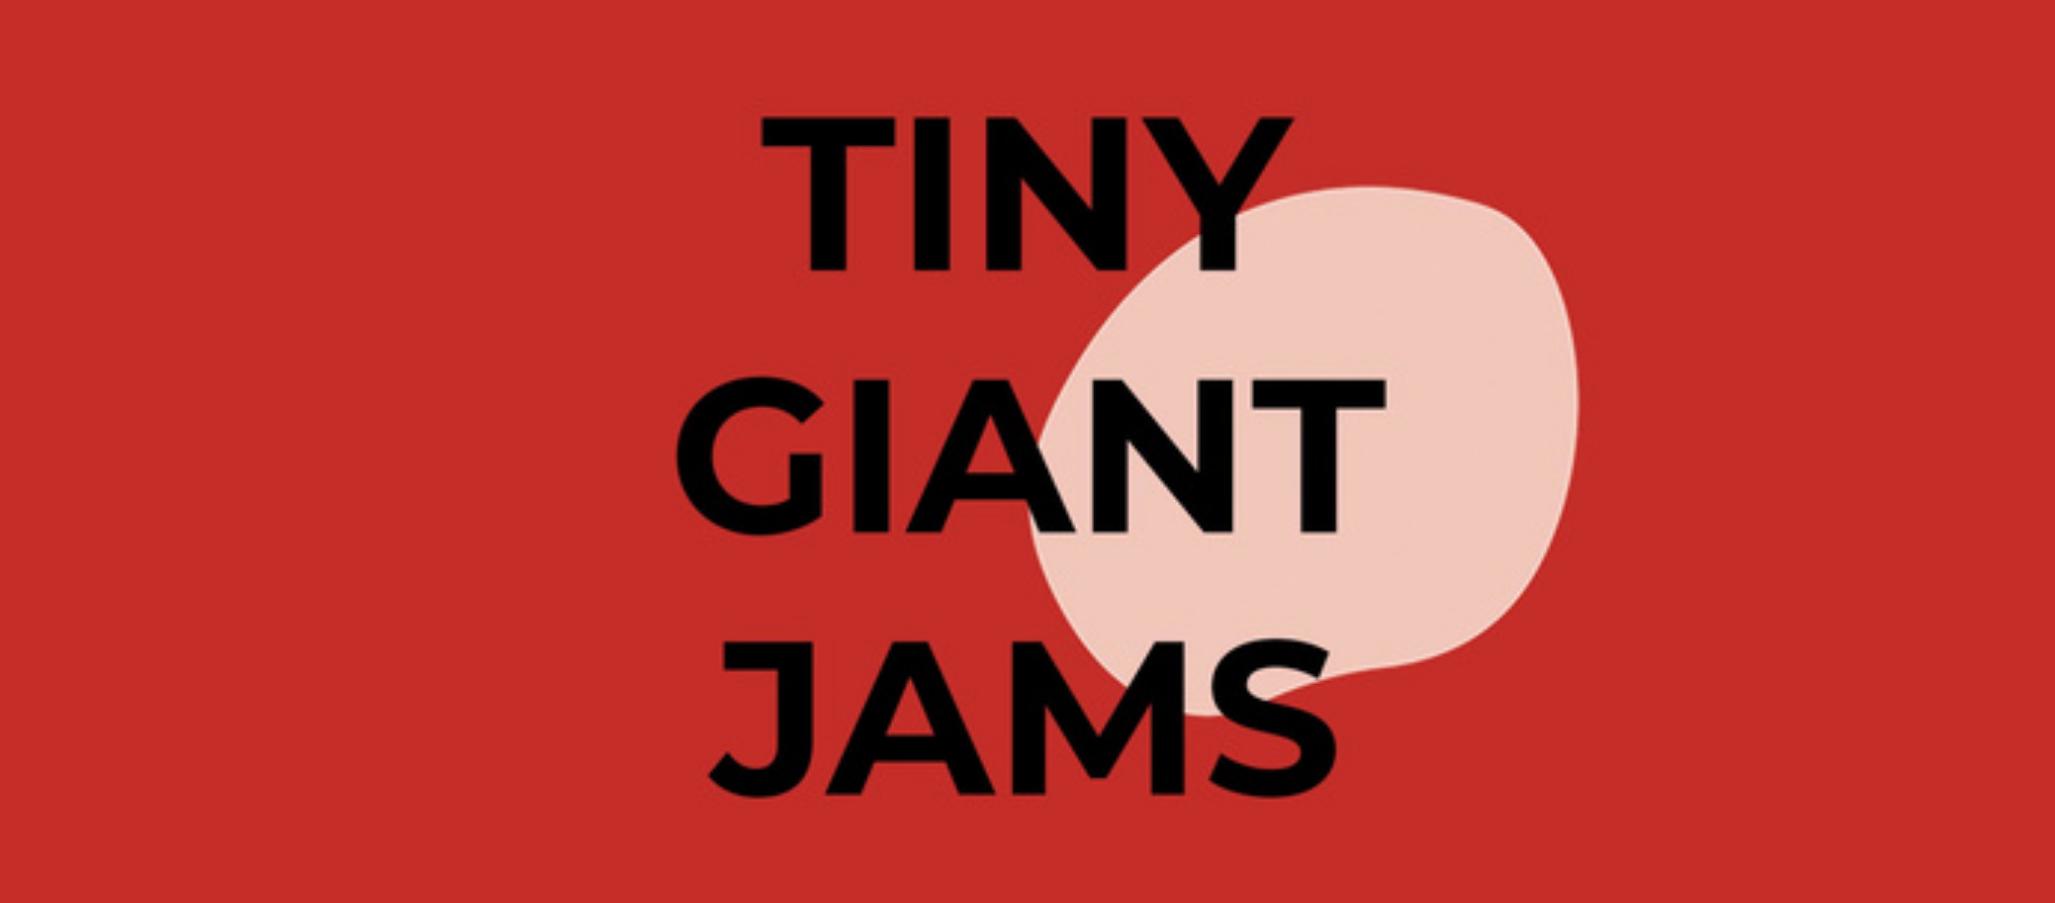 Tiny Giant Jams Podcast: Knight's At The Profound Table